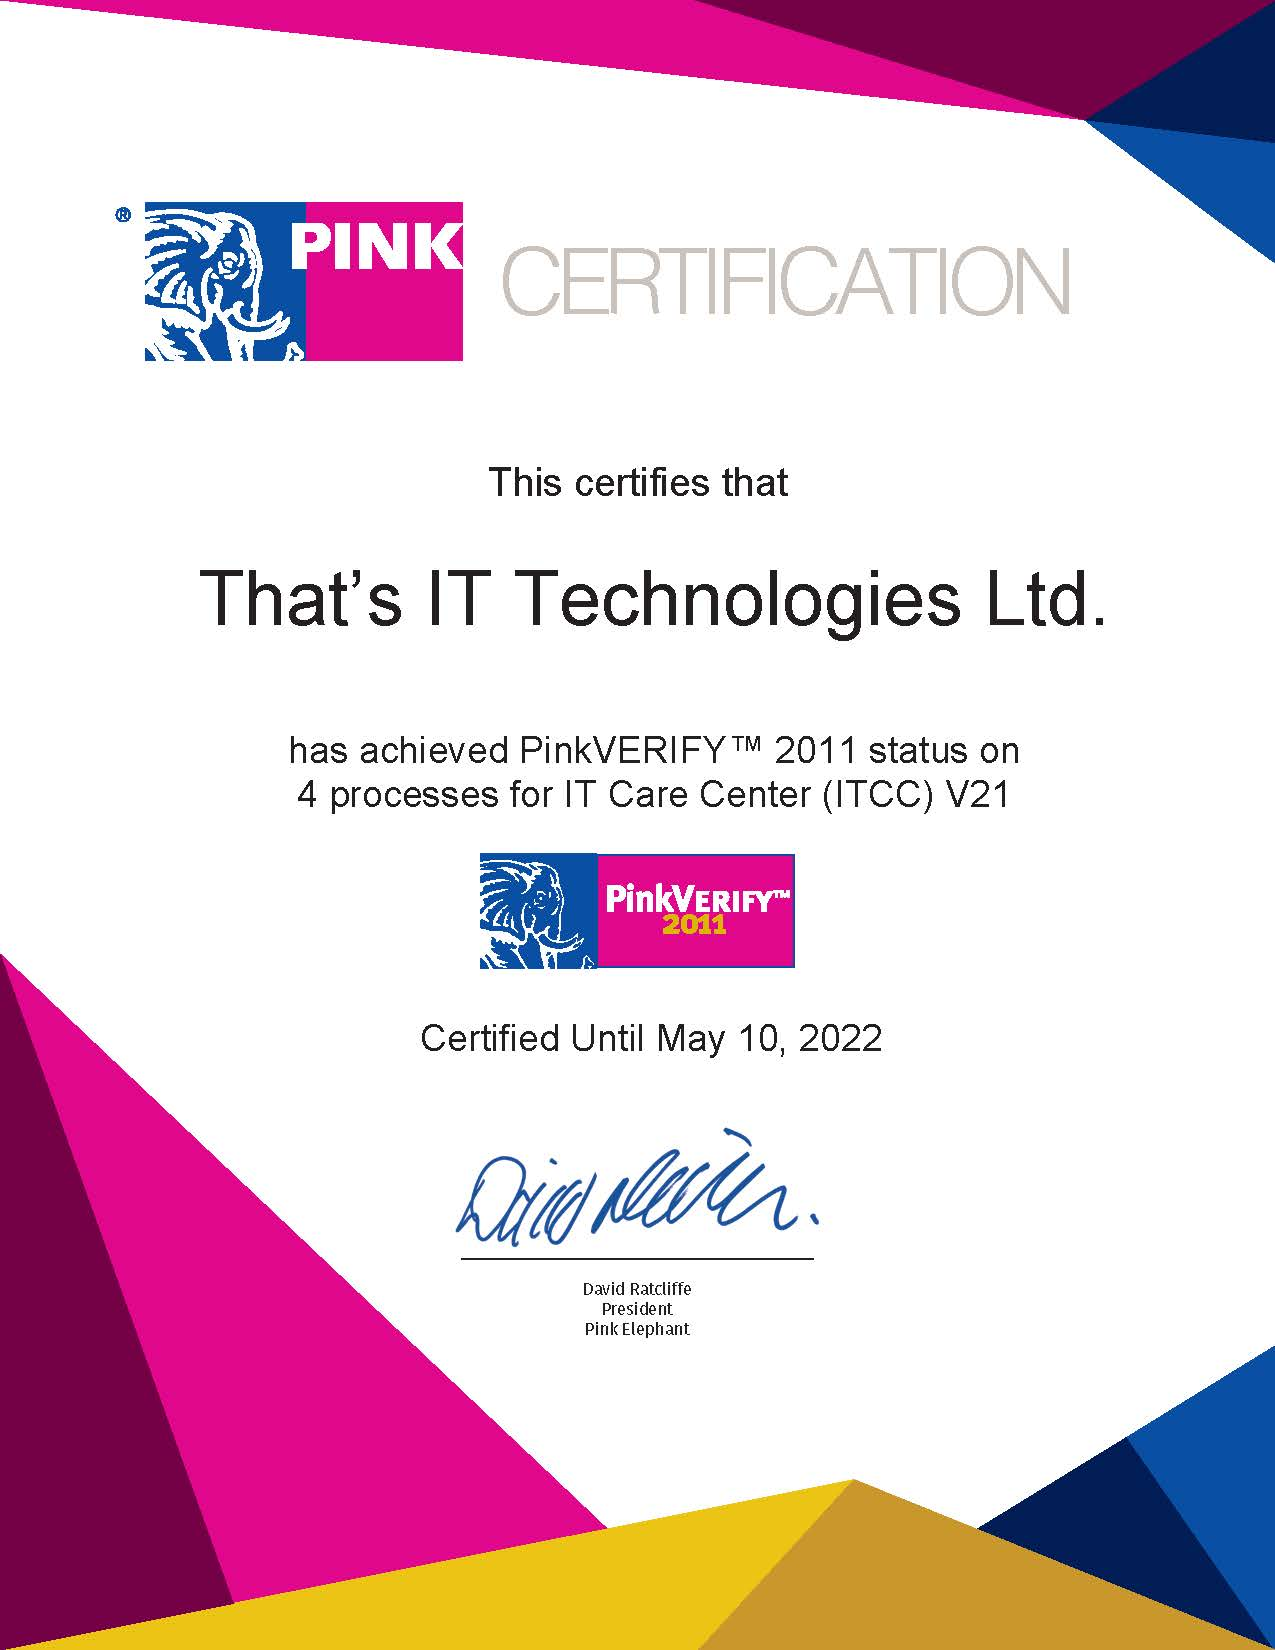 Pink Elephant Certification